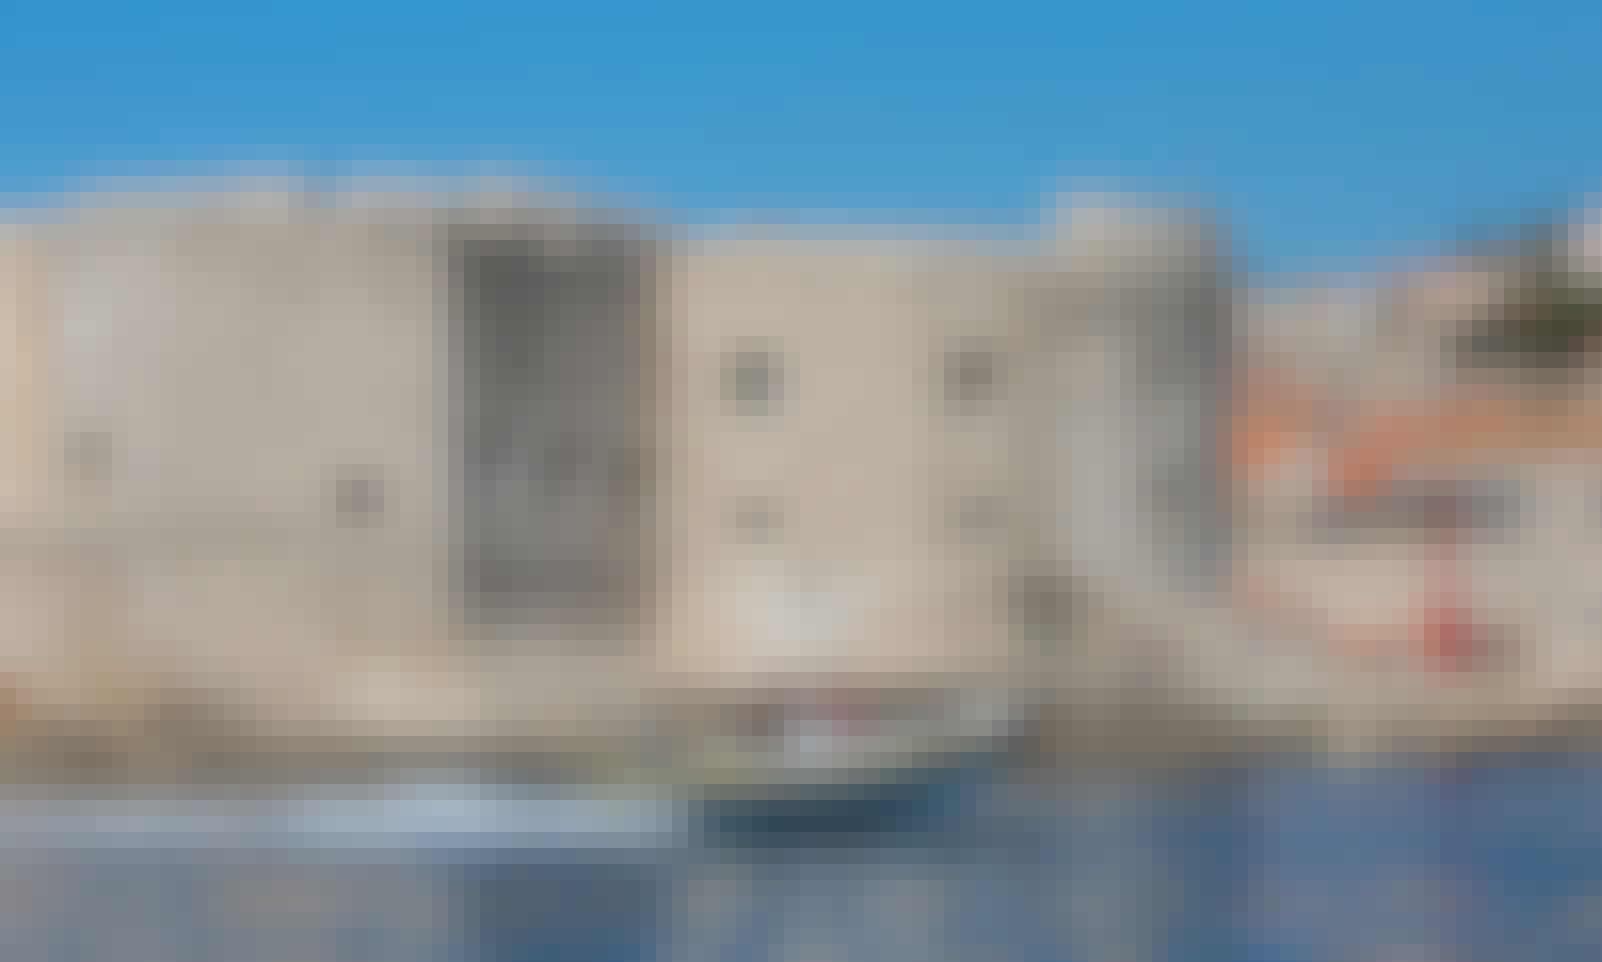 Experience the Adriatic Sea on this RIB rental in Dubrovnik, Croatia